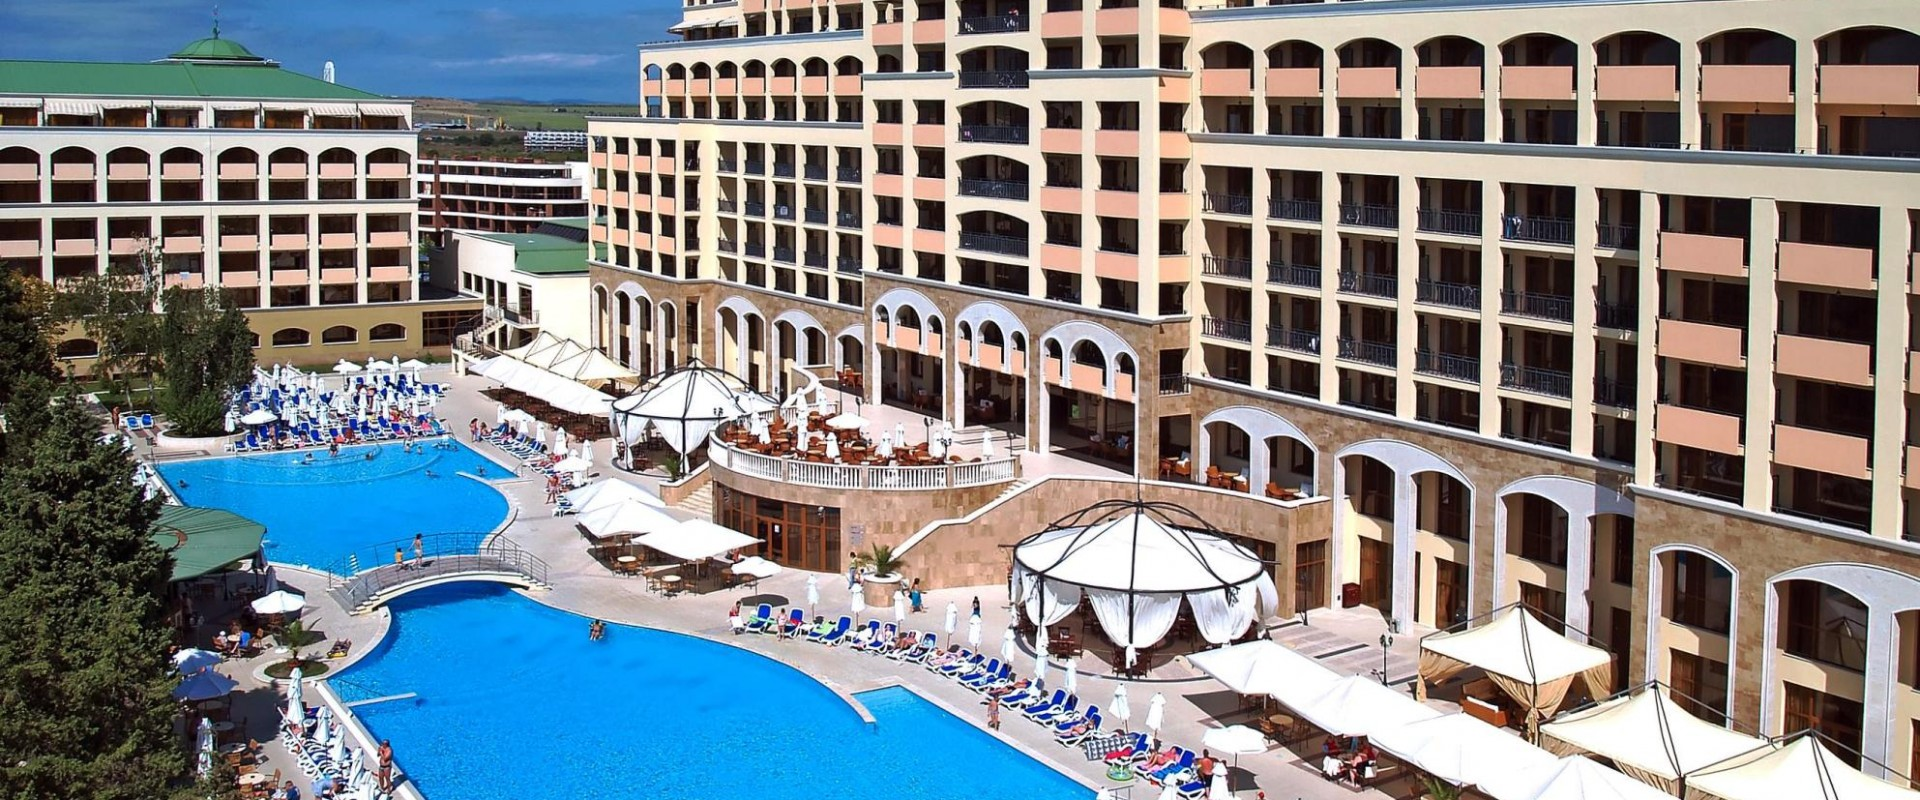 Bulgaria, Nessebar, Hotel Sol Nessebar Palace Resort & Aquapark